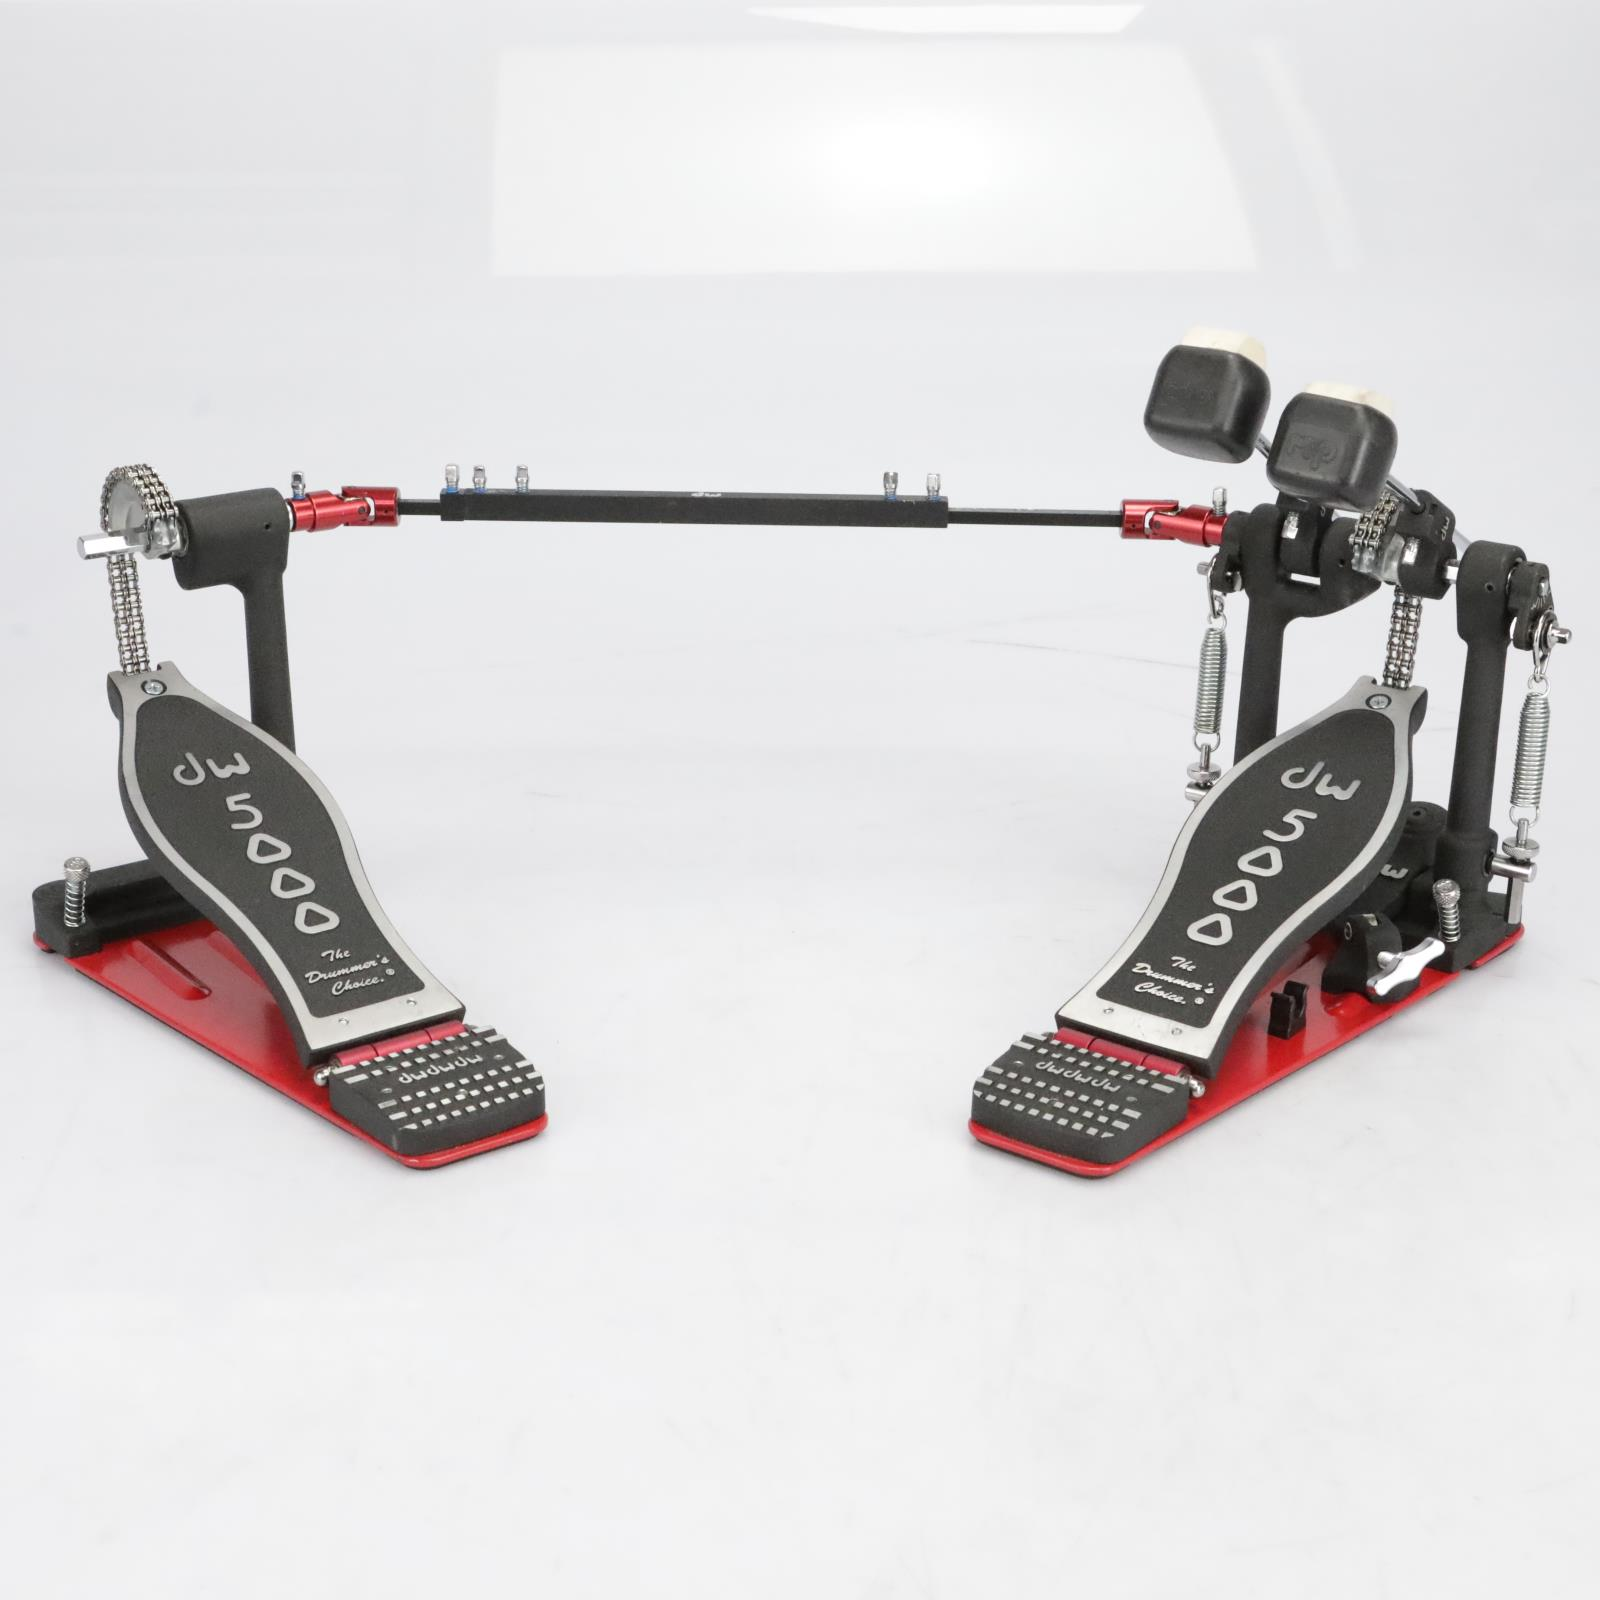 DW 5000 Series Turbo Double Bass Drum Pedal w/ DW Pedal Bag #41096